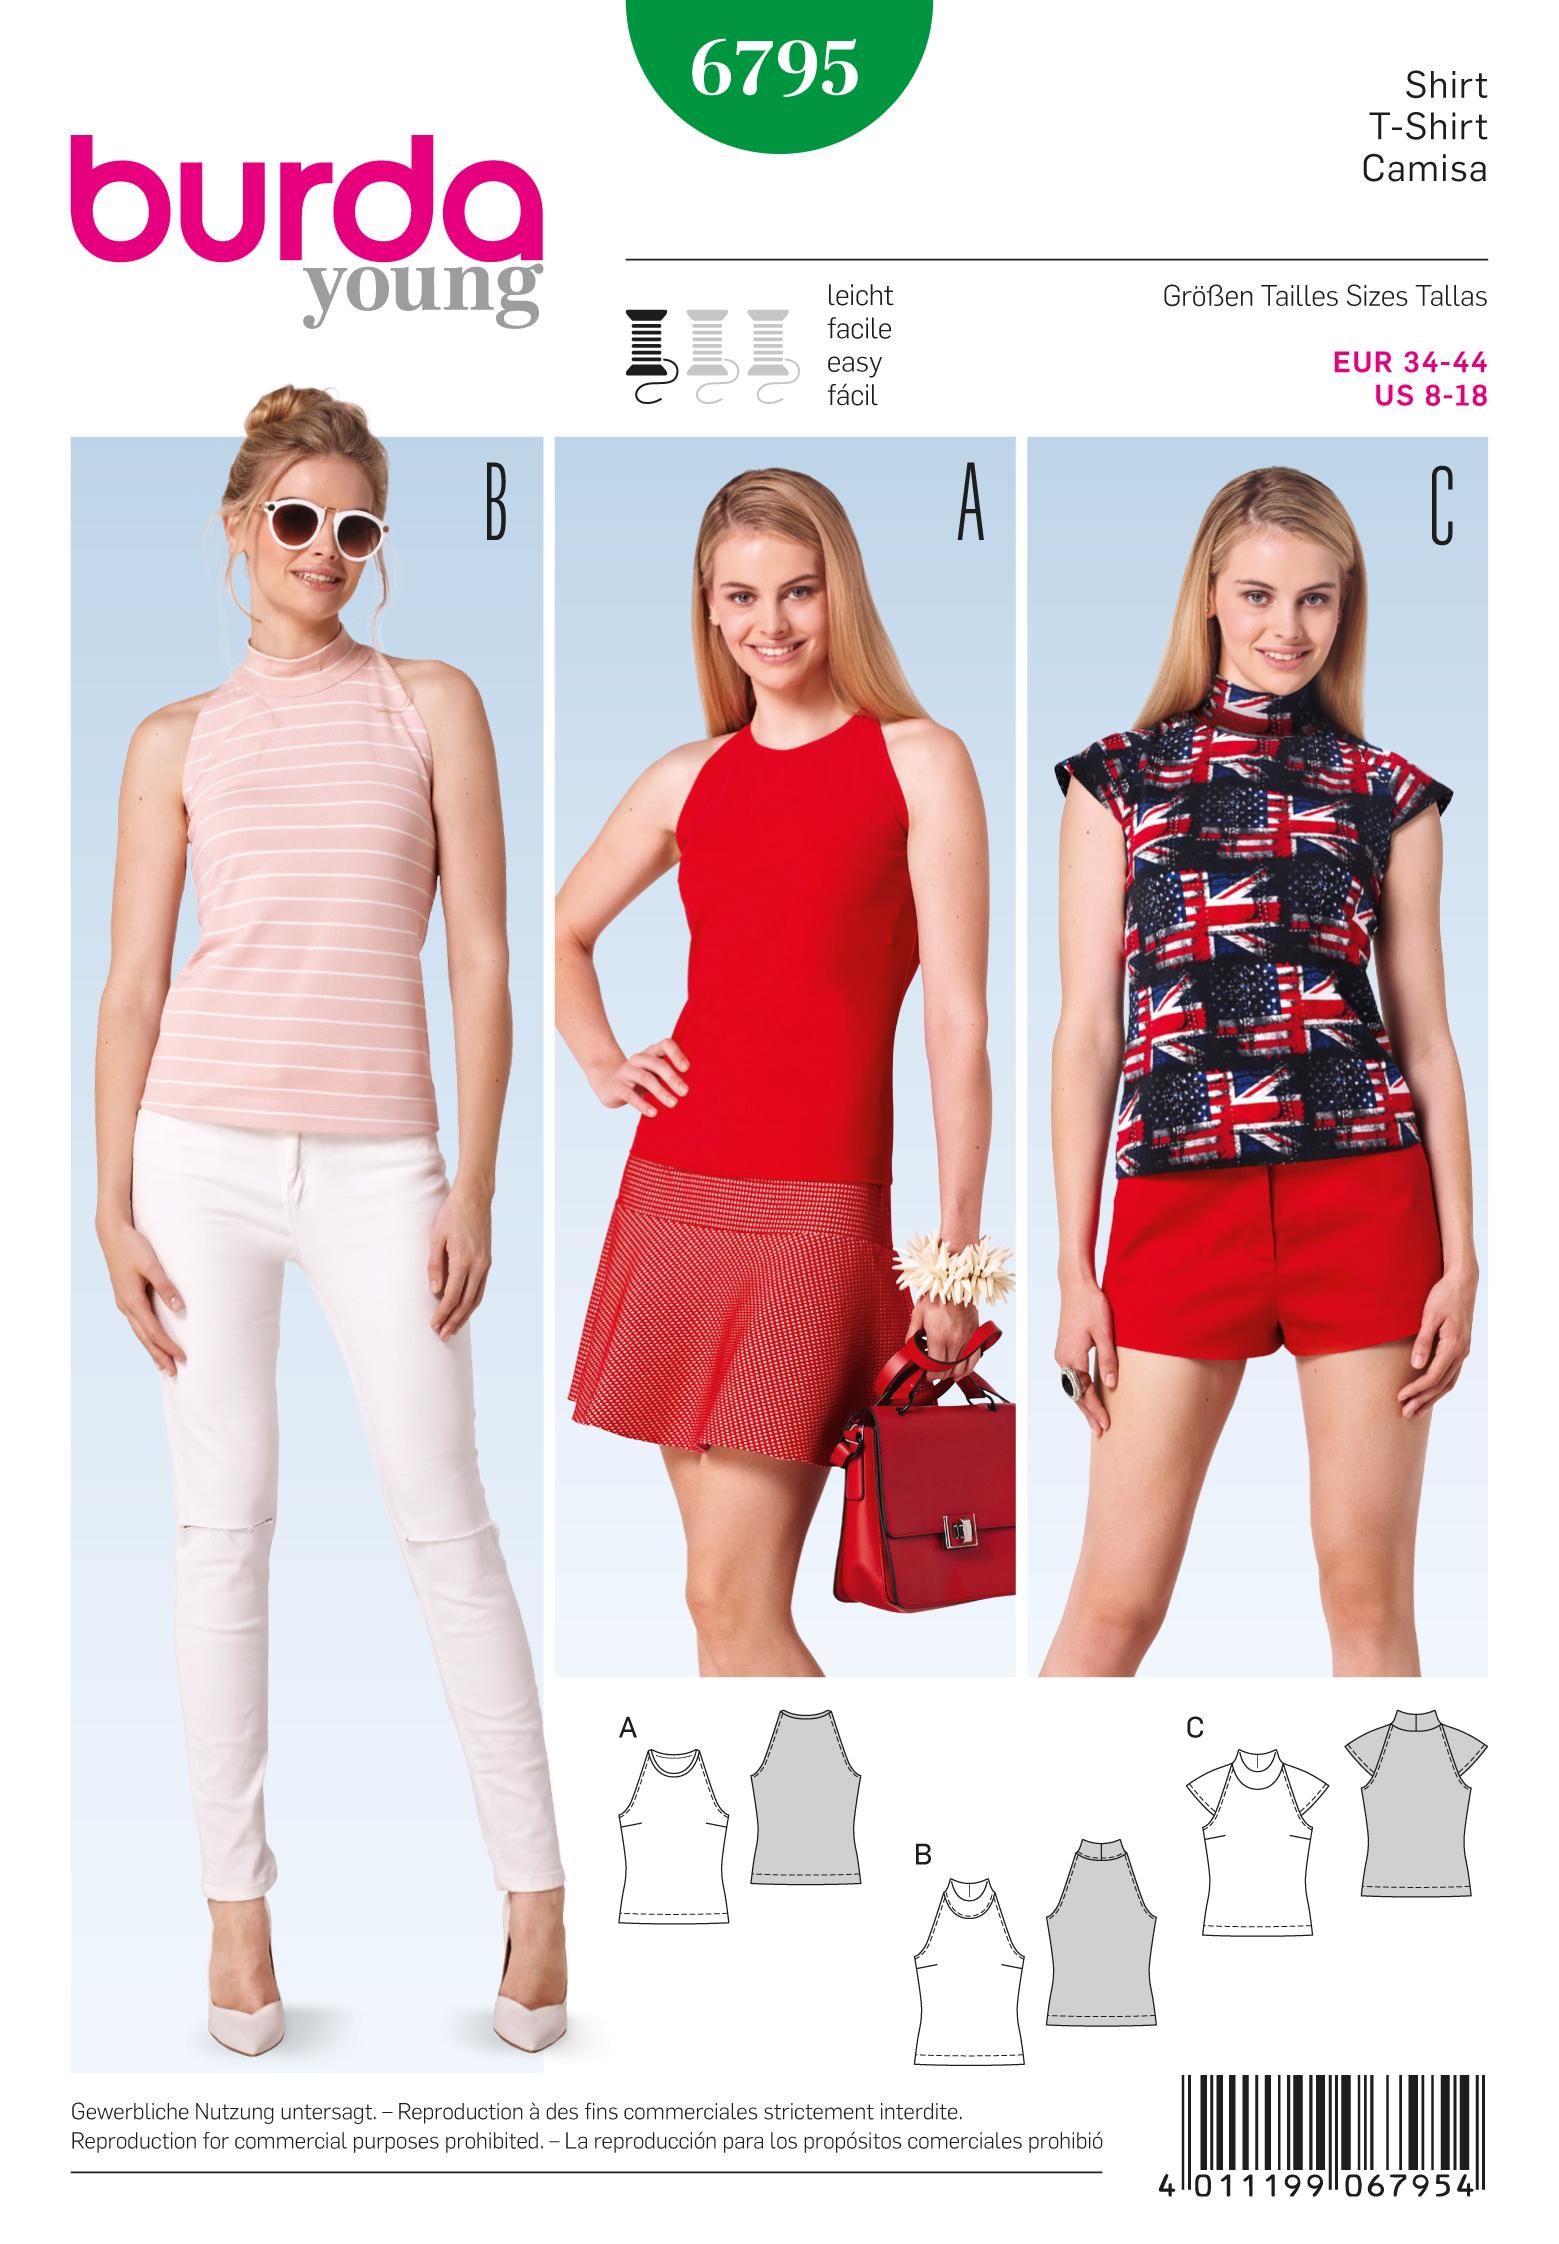 Burda 6795 Burda Style Tops, Shirts, Blouses